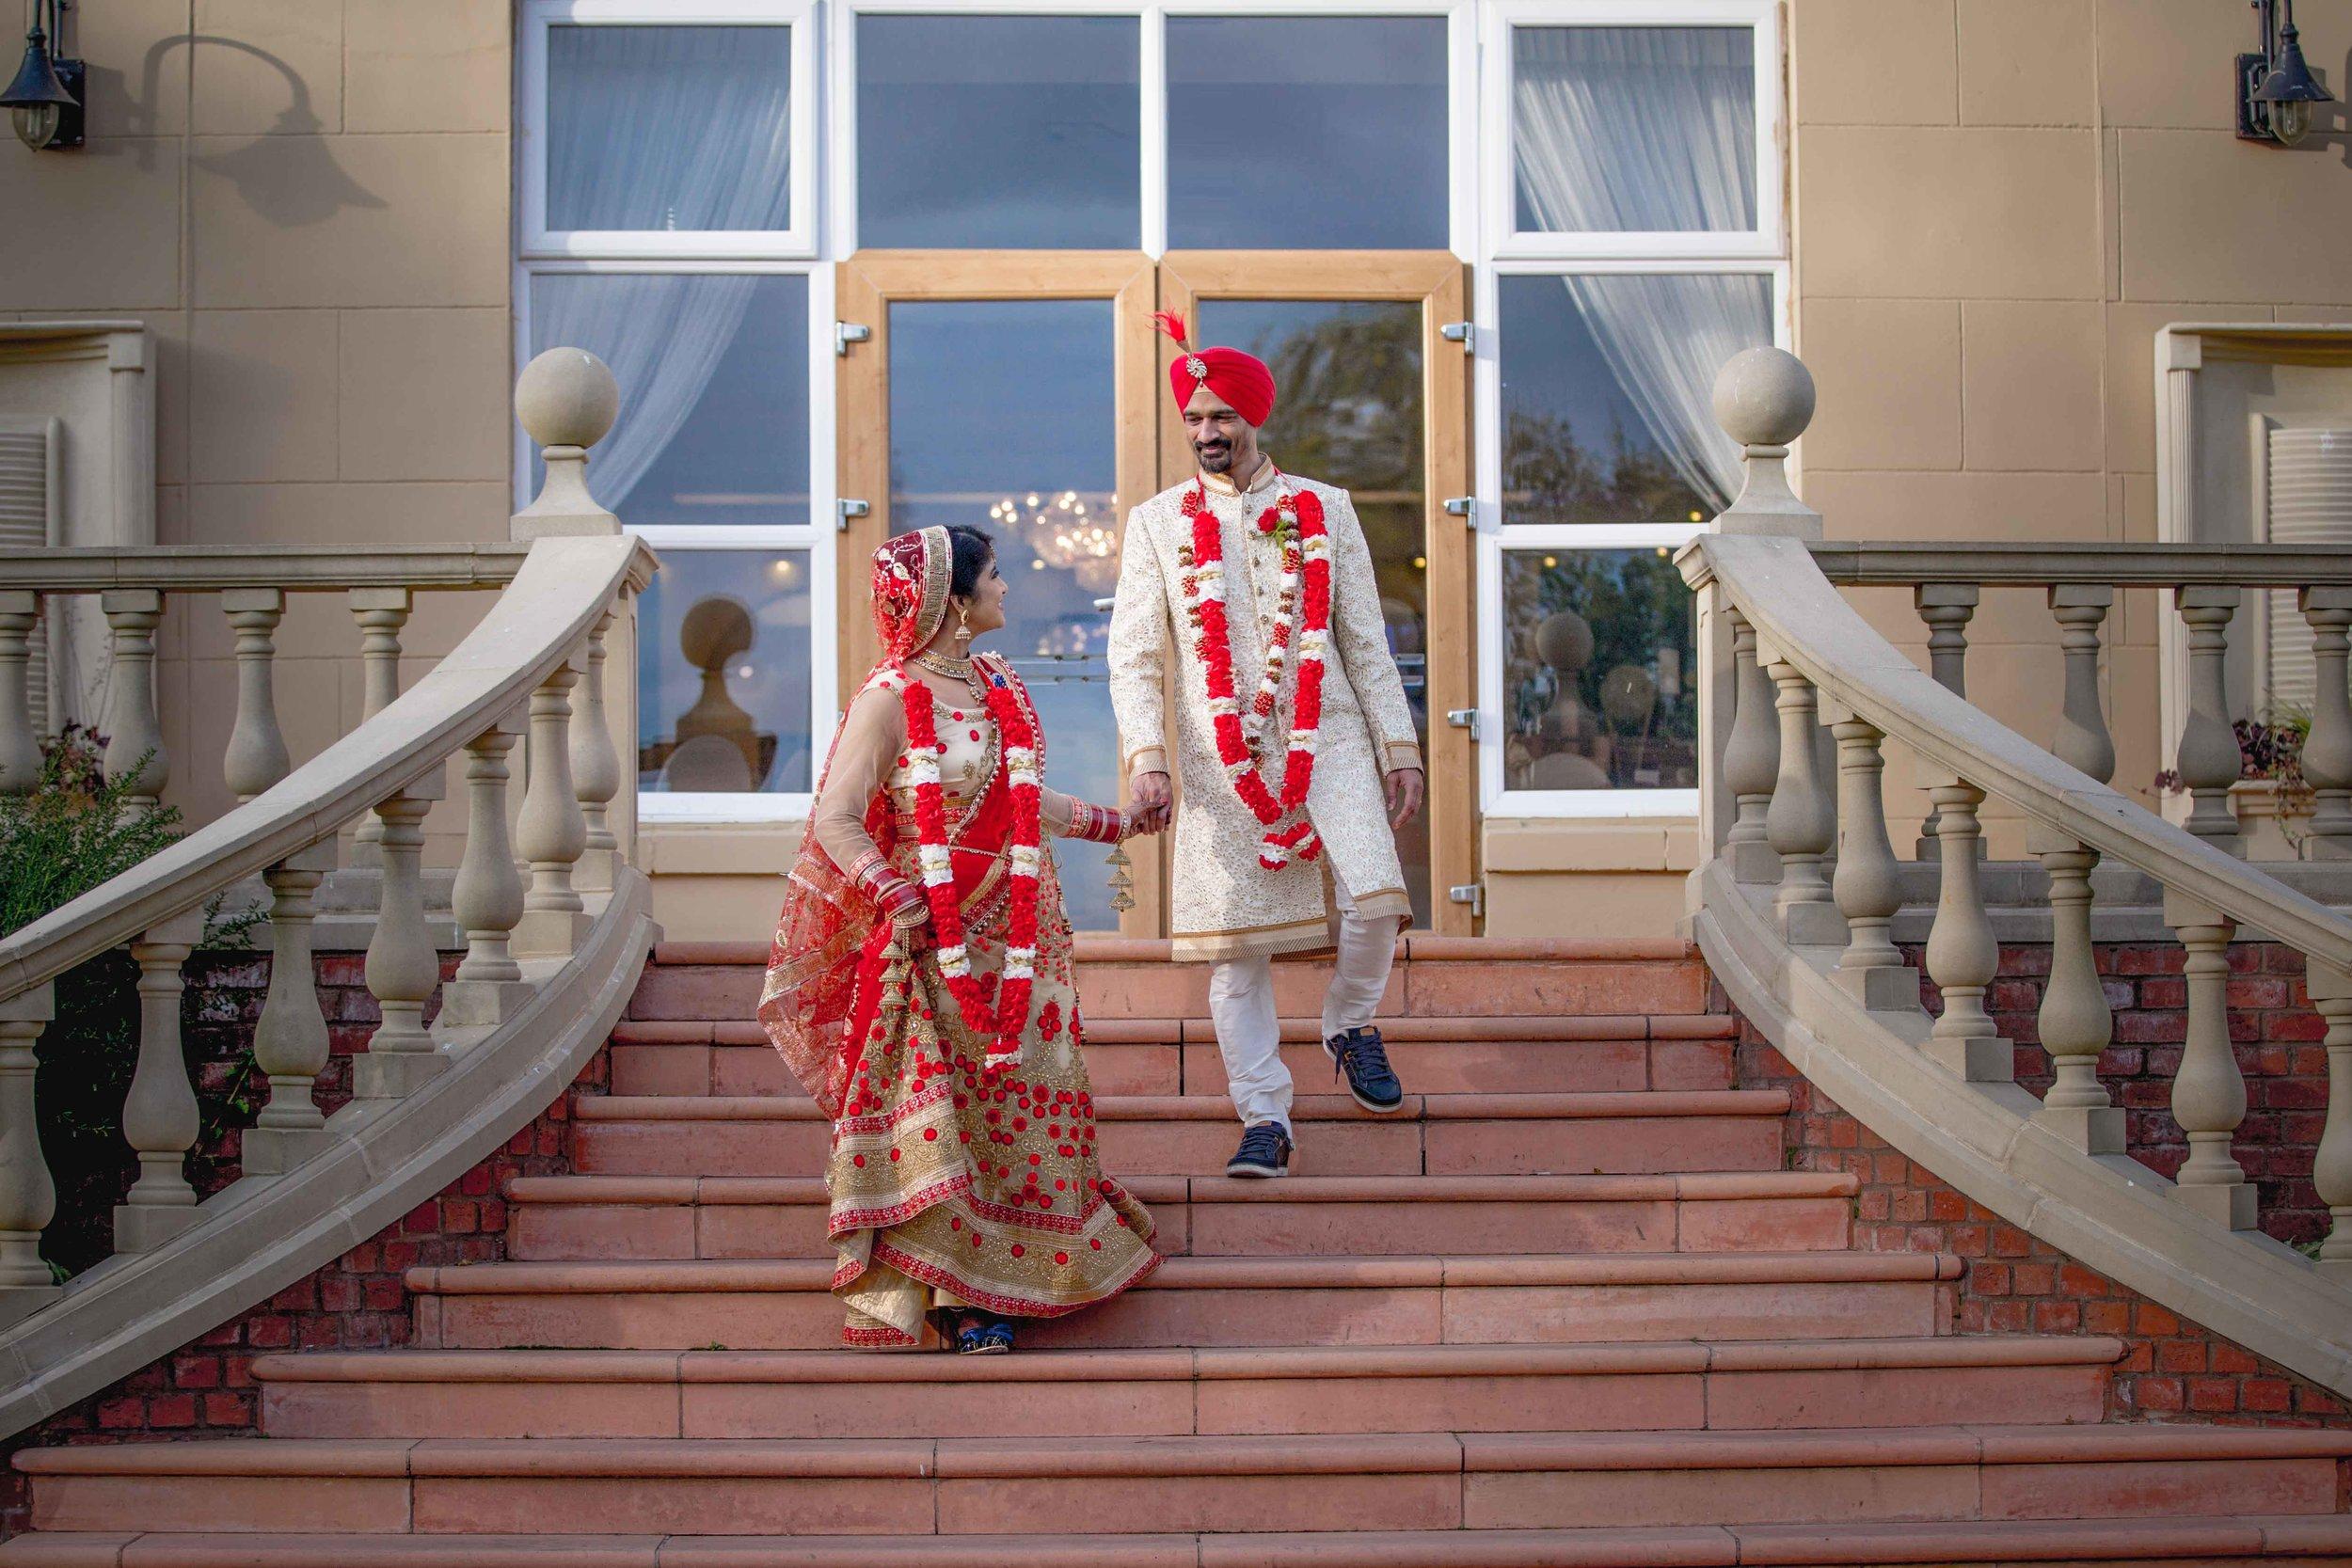 ramada-park-hall-hotel-birmingham-wolverhampton-hindu-wedding-asian-wedding-photography-natalia-smith-photography-32.jpg